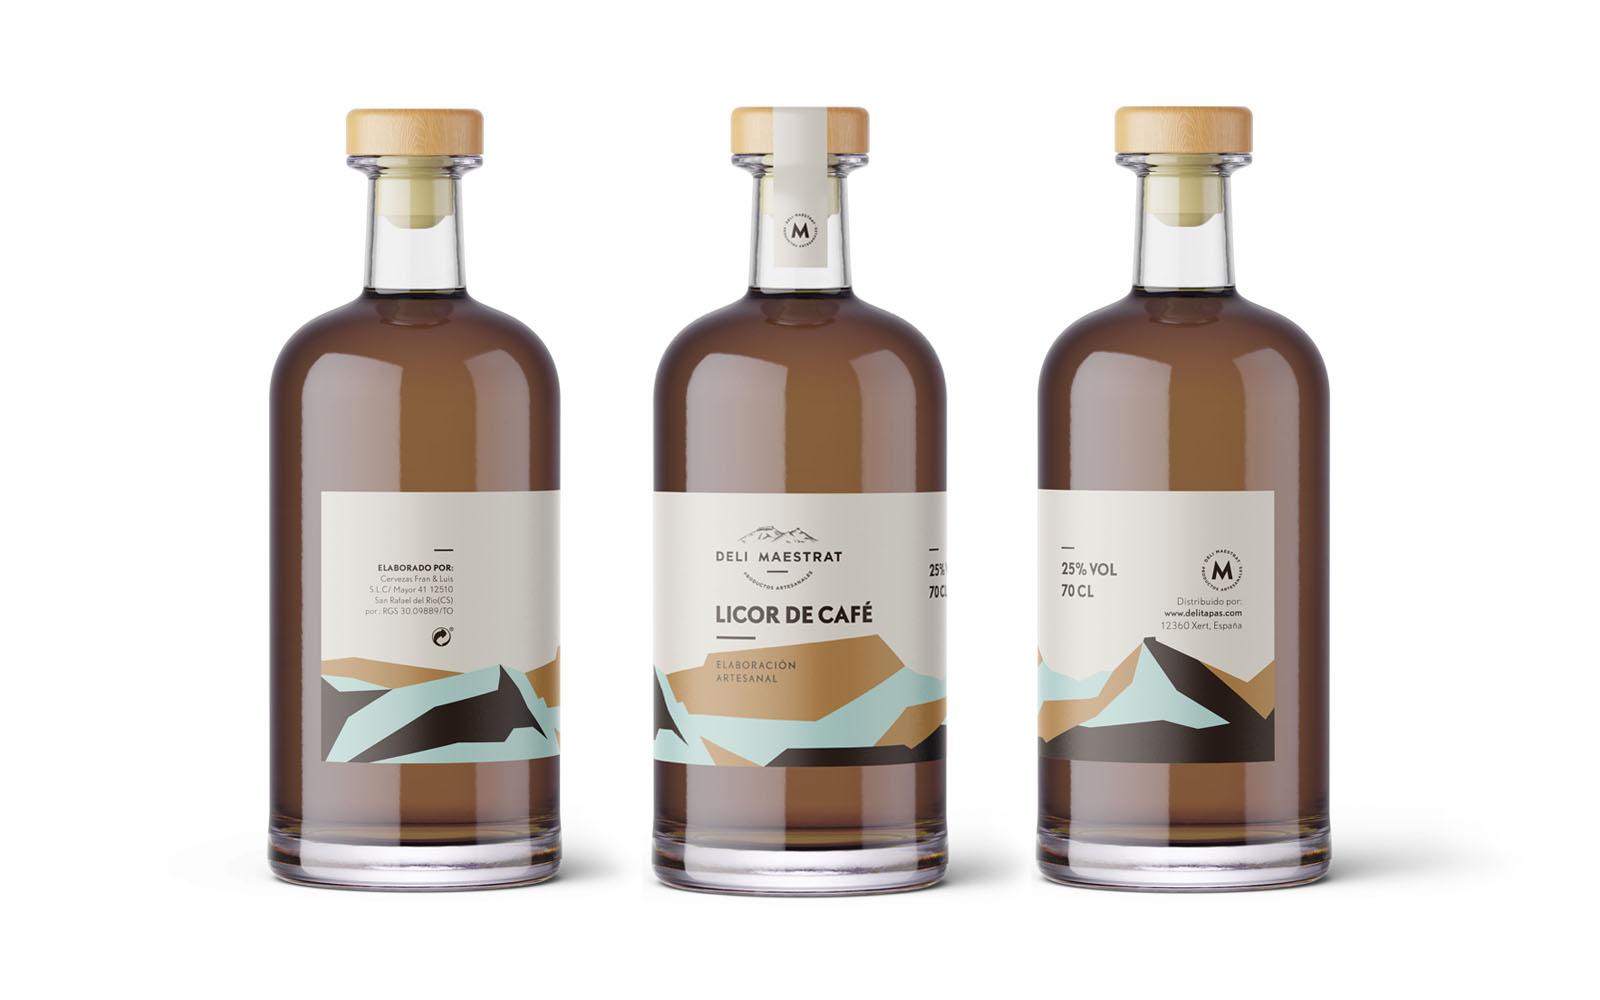 Diseño de etiqueta para licor de café Deli Maestrat